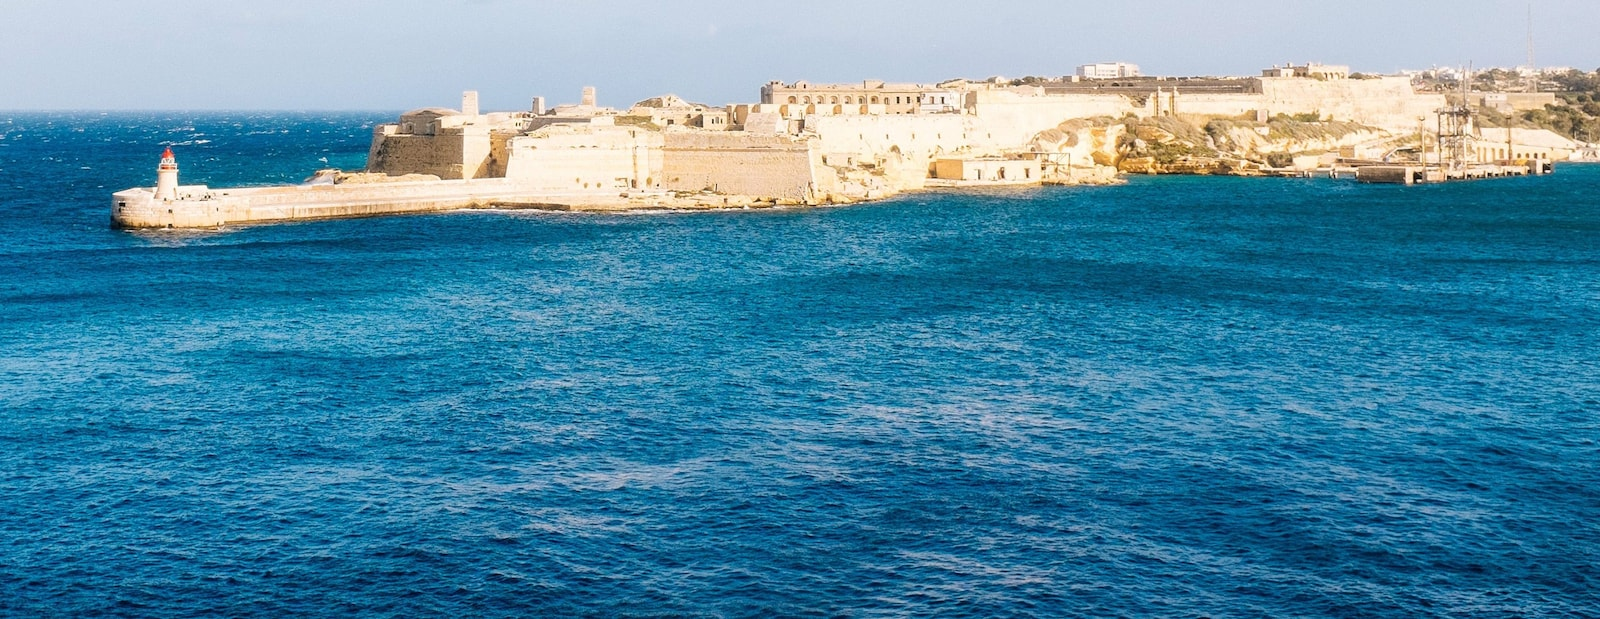 Malta的度假屋